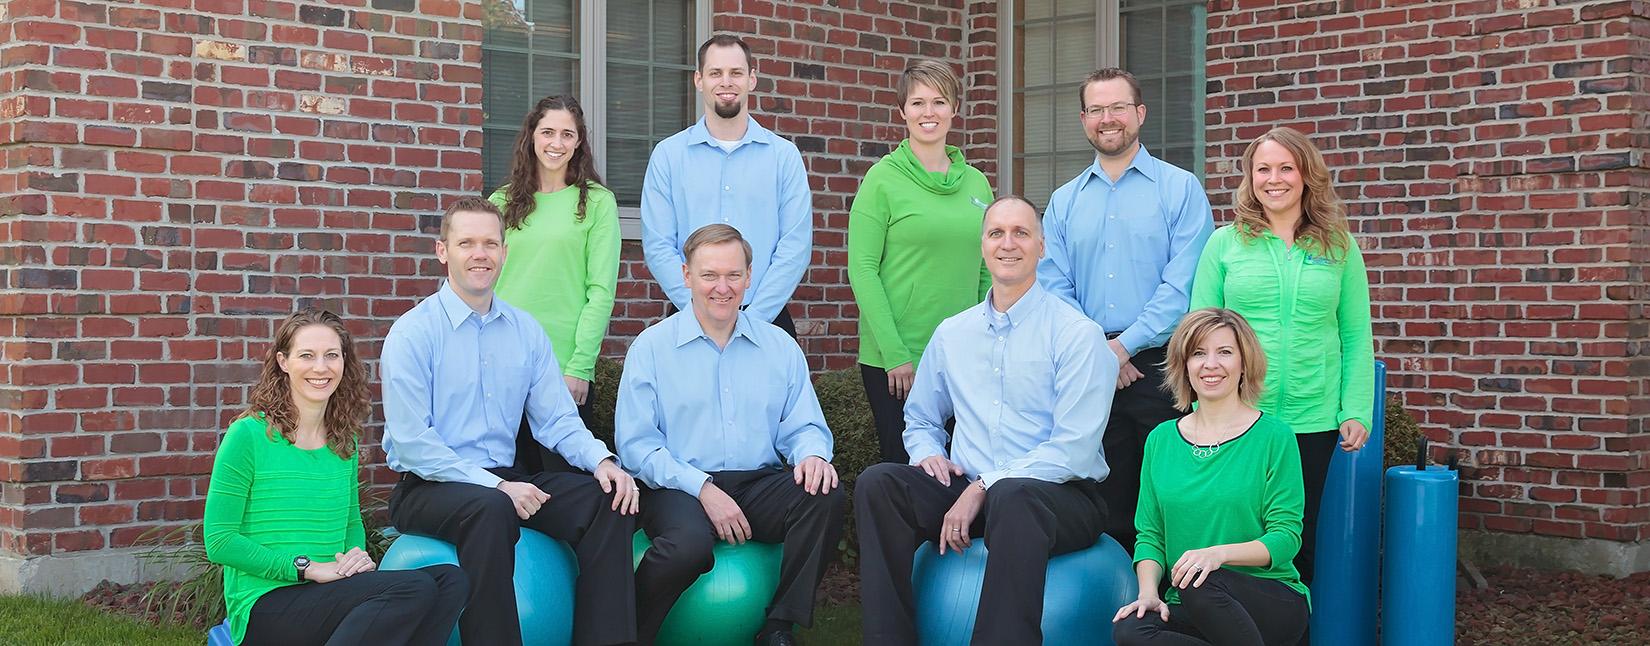 the Northern Rehab Therapist team